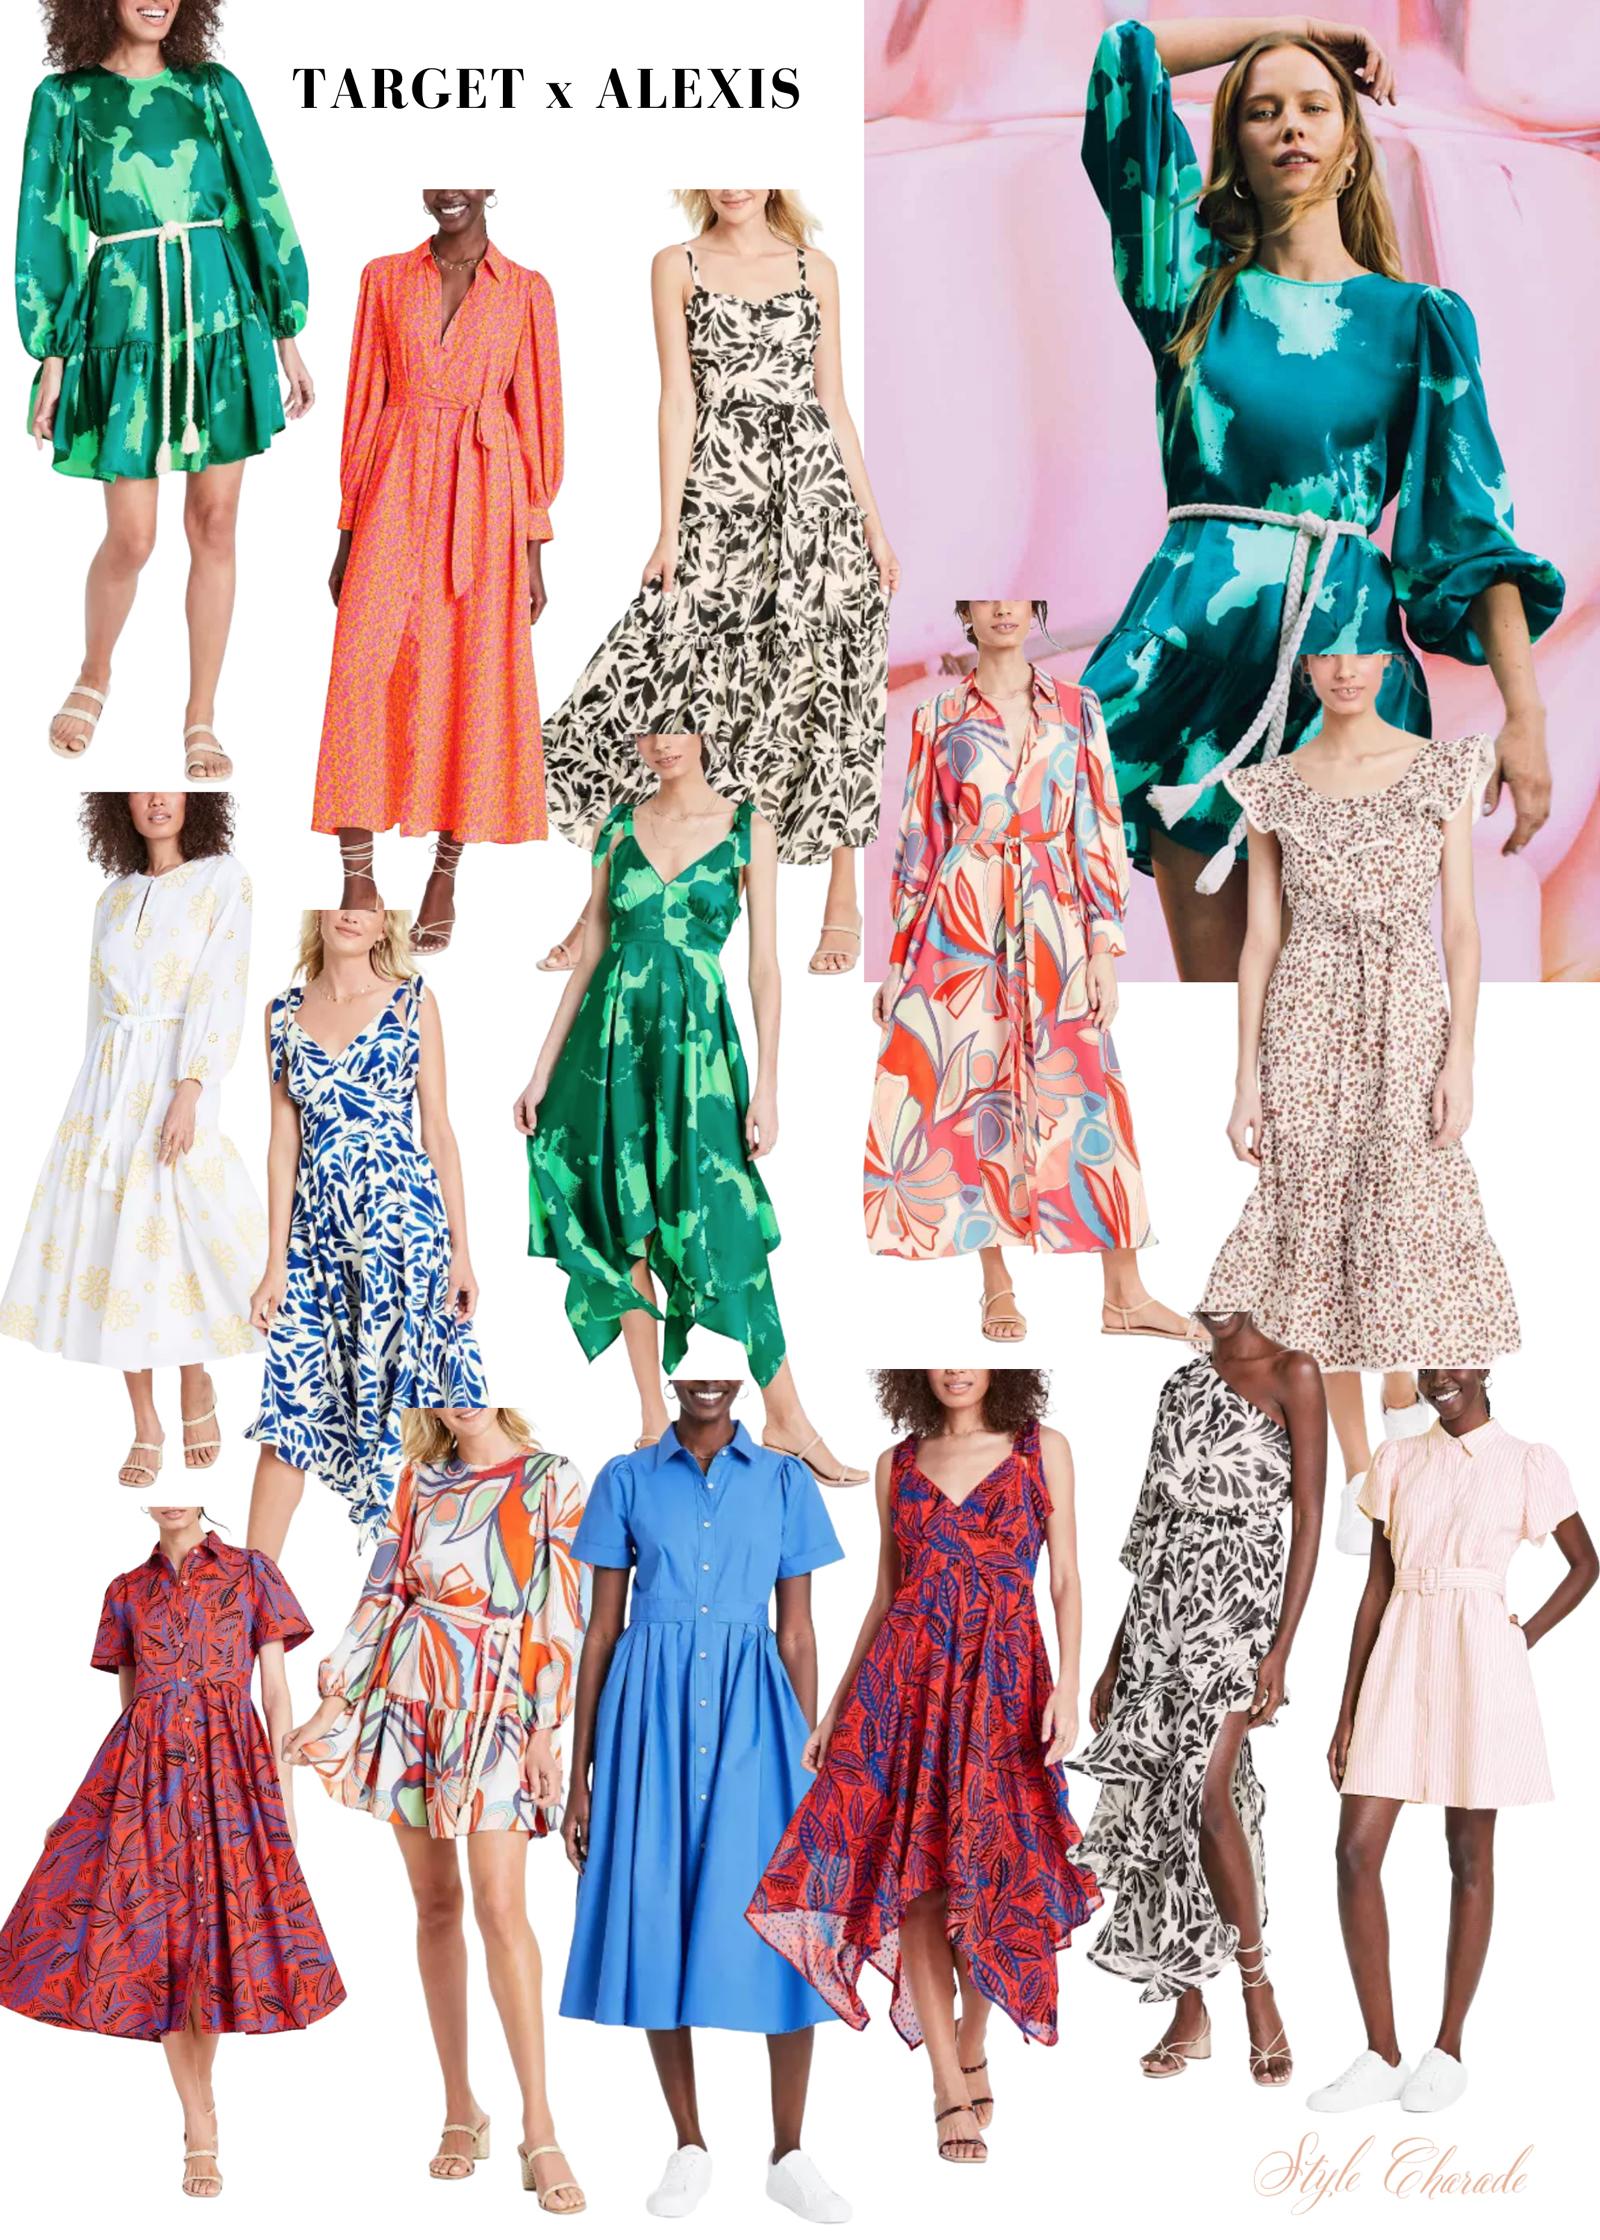 Target Alexis Dresses